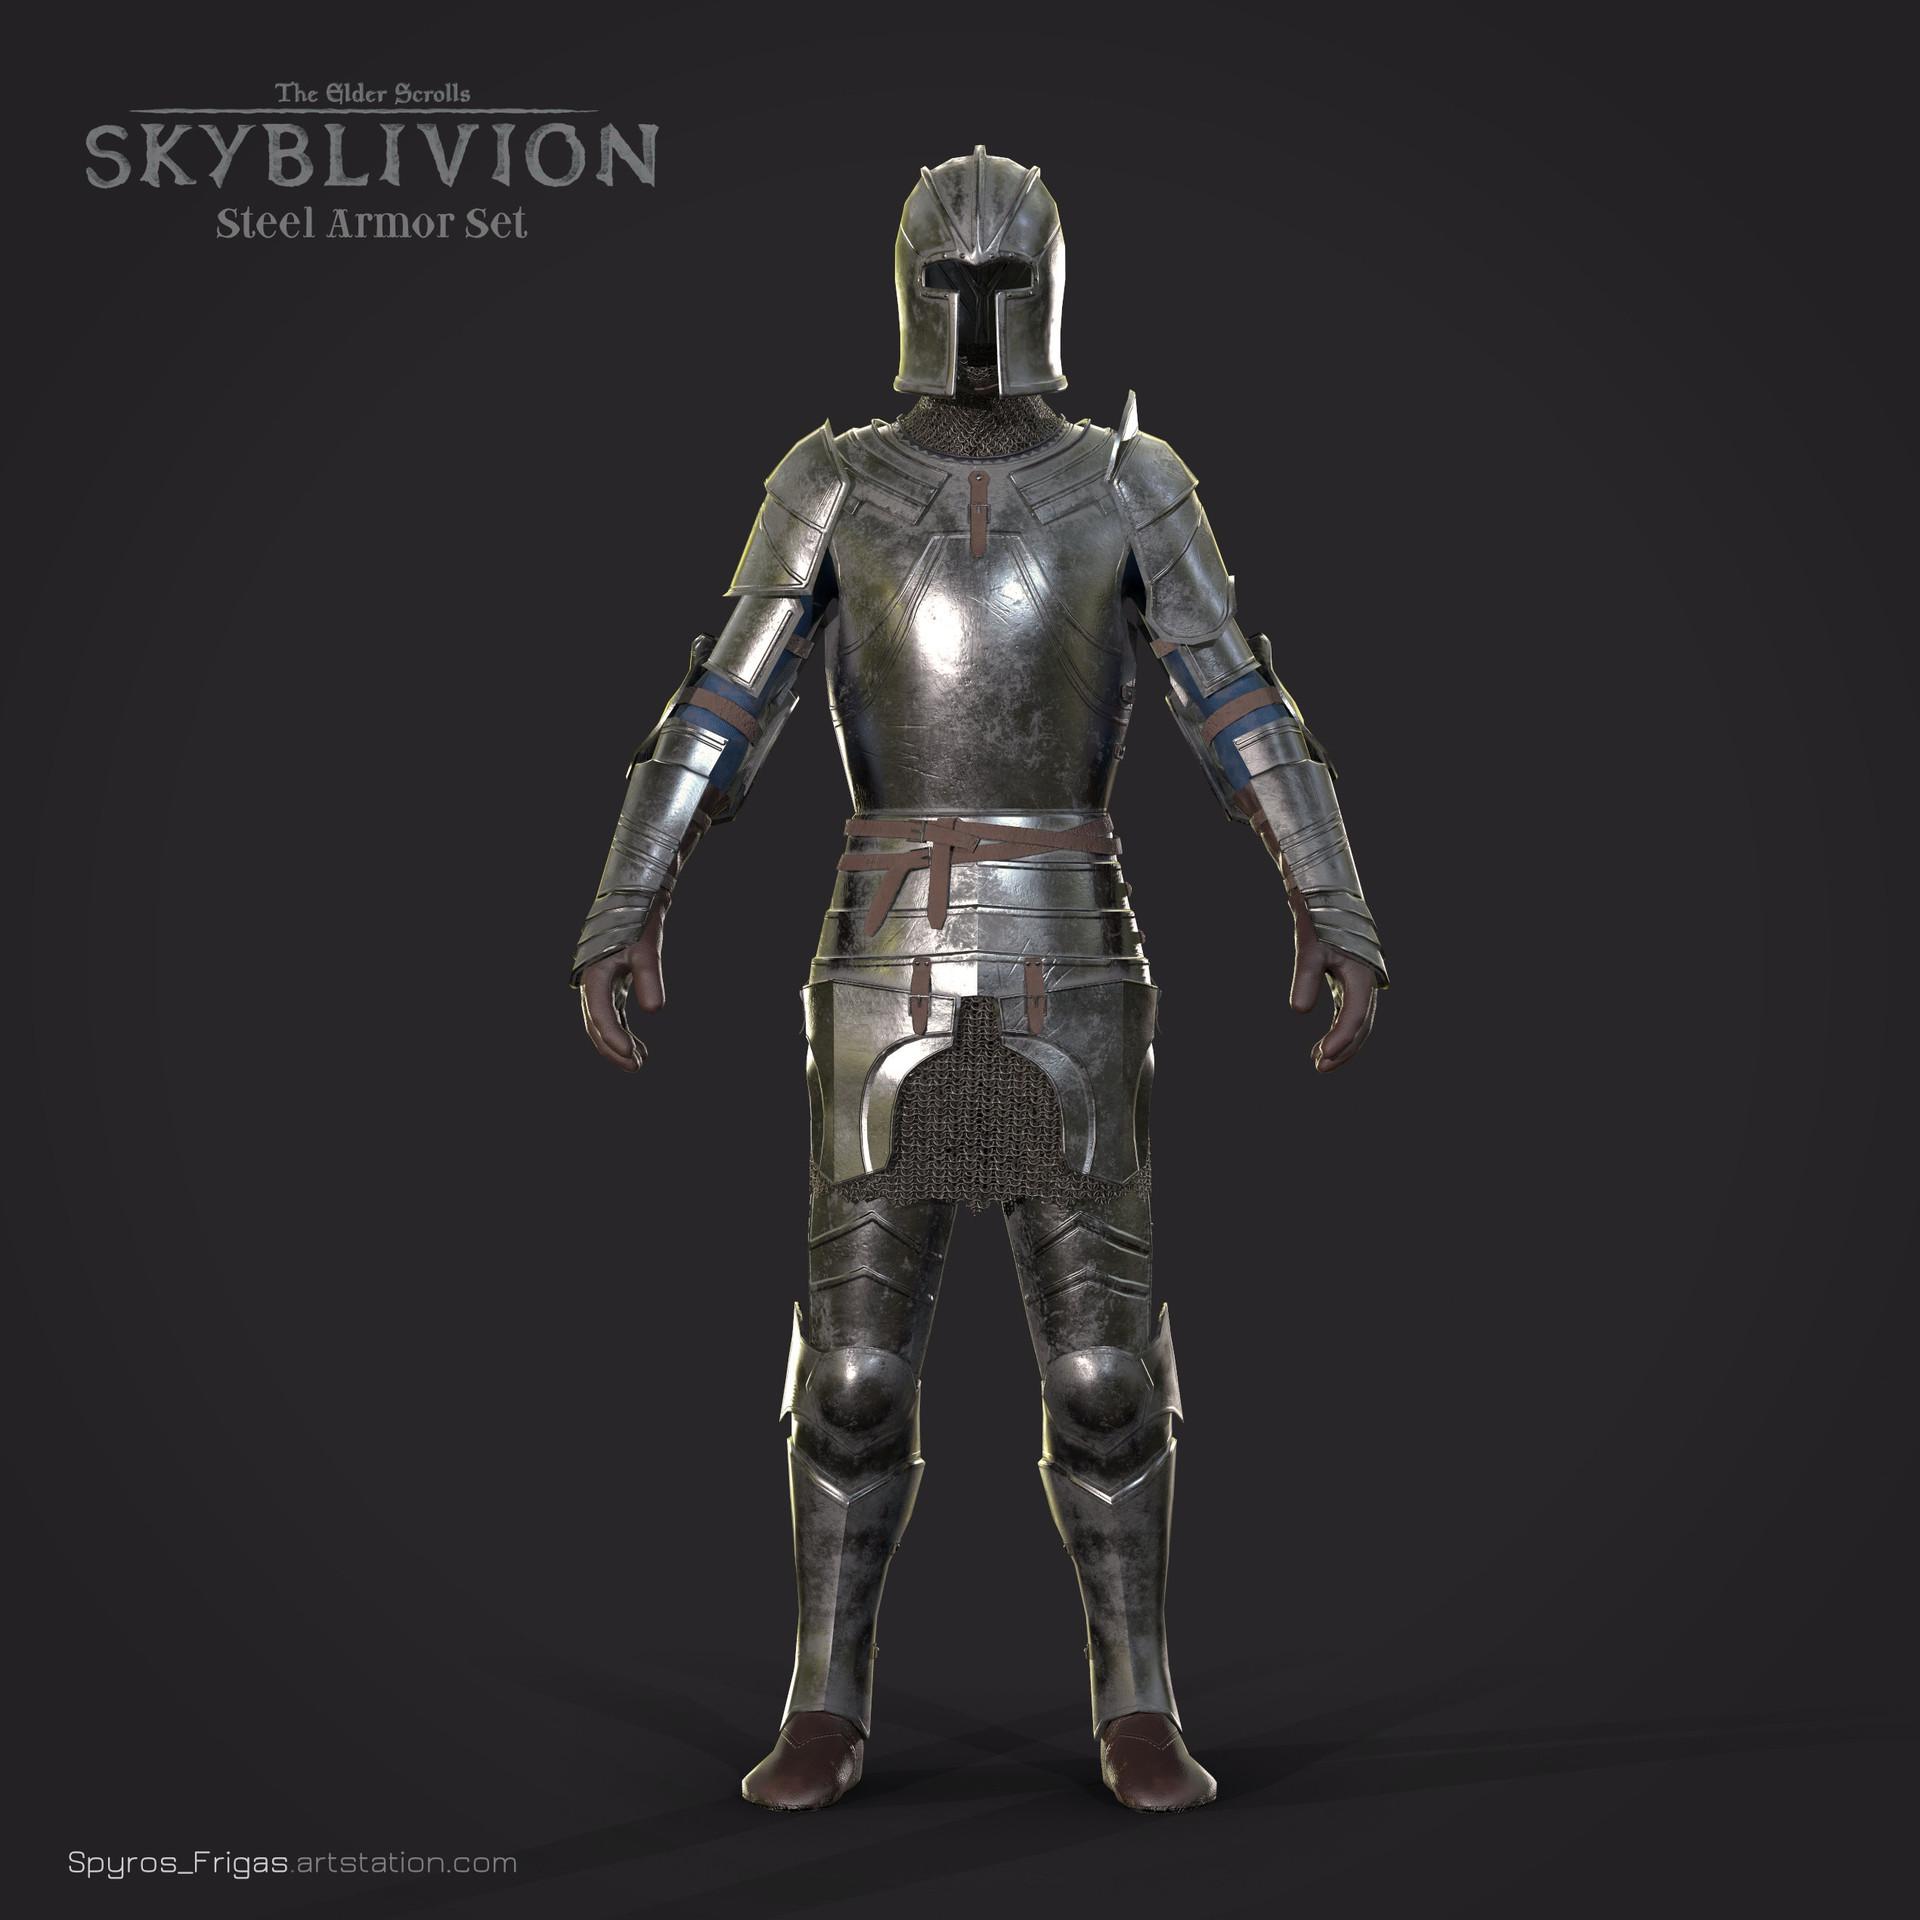 ArtStation - Steel Armor set - TES:Skyblivion, Spyros Frigas